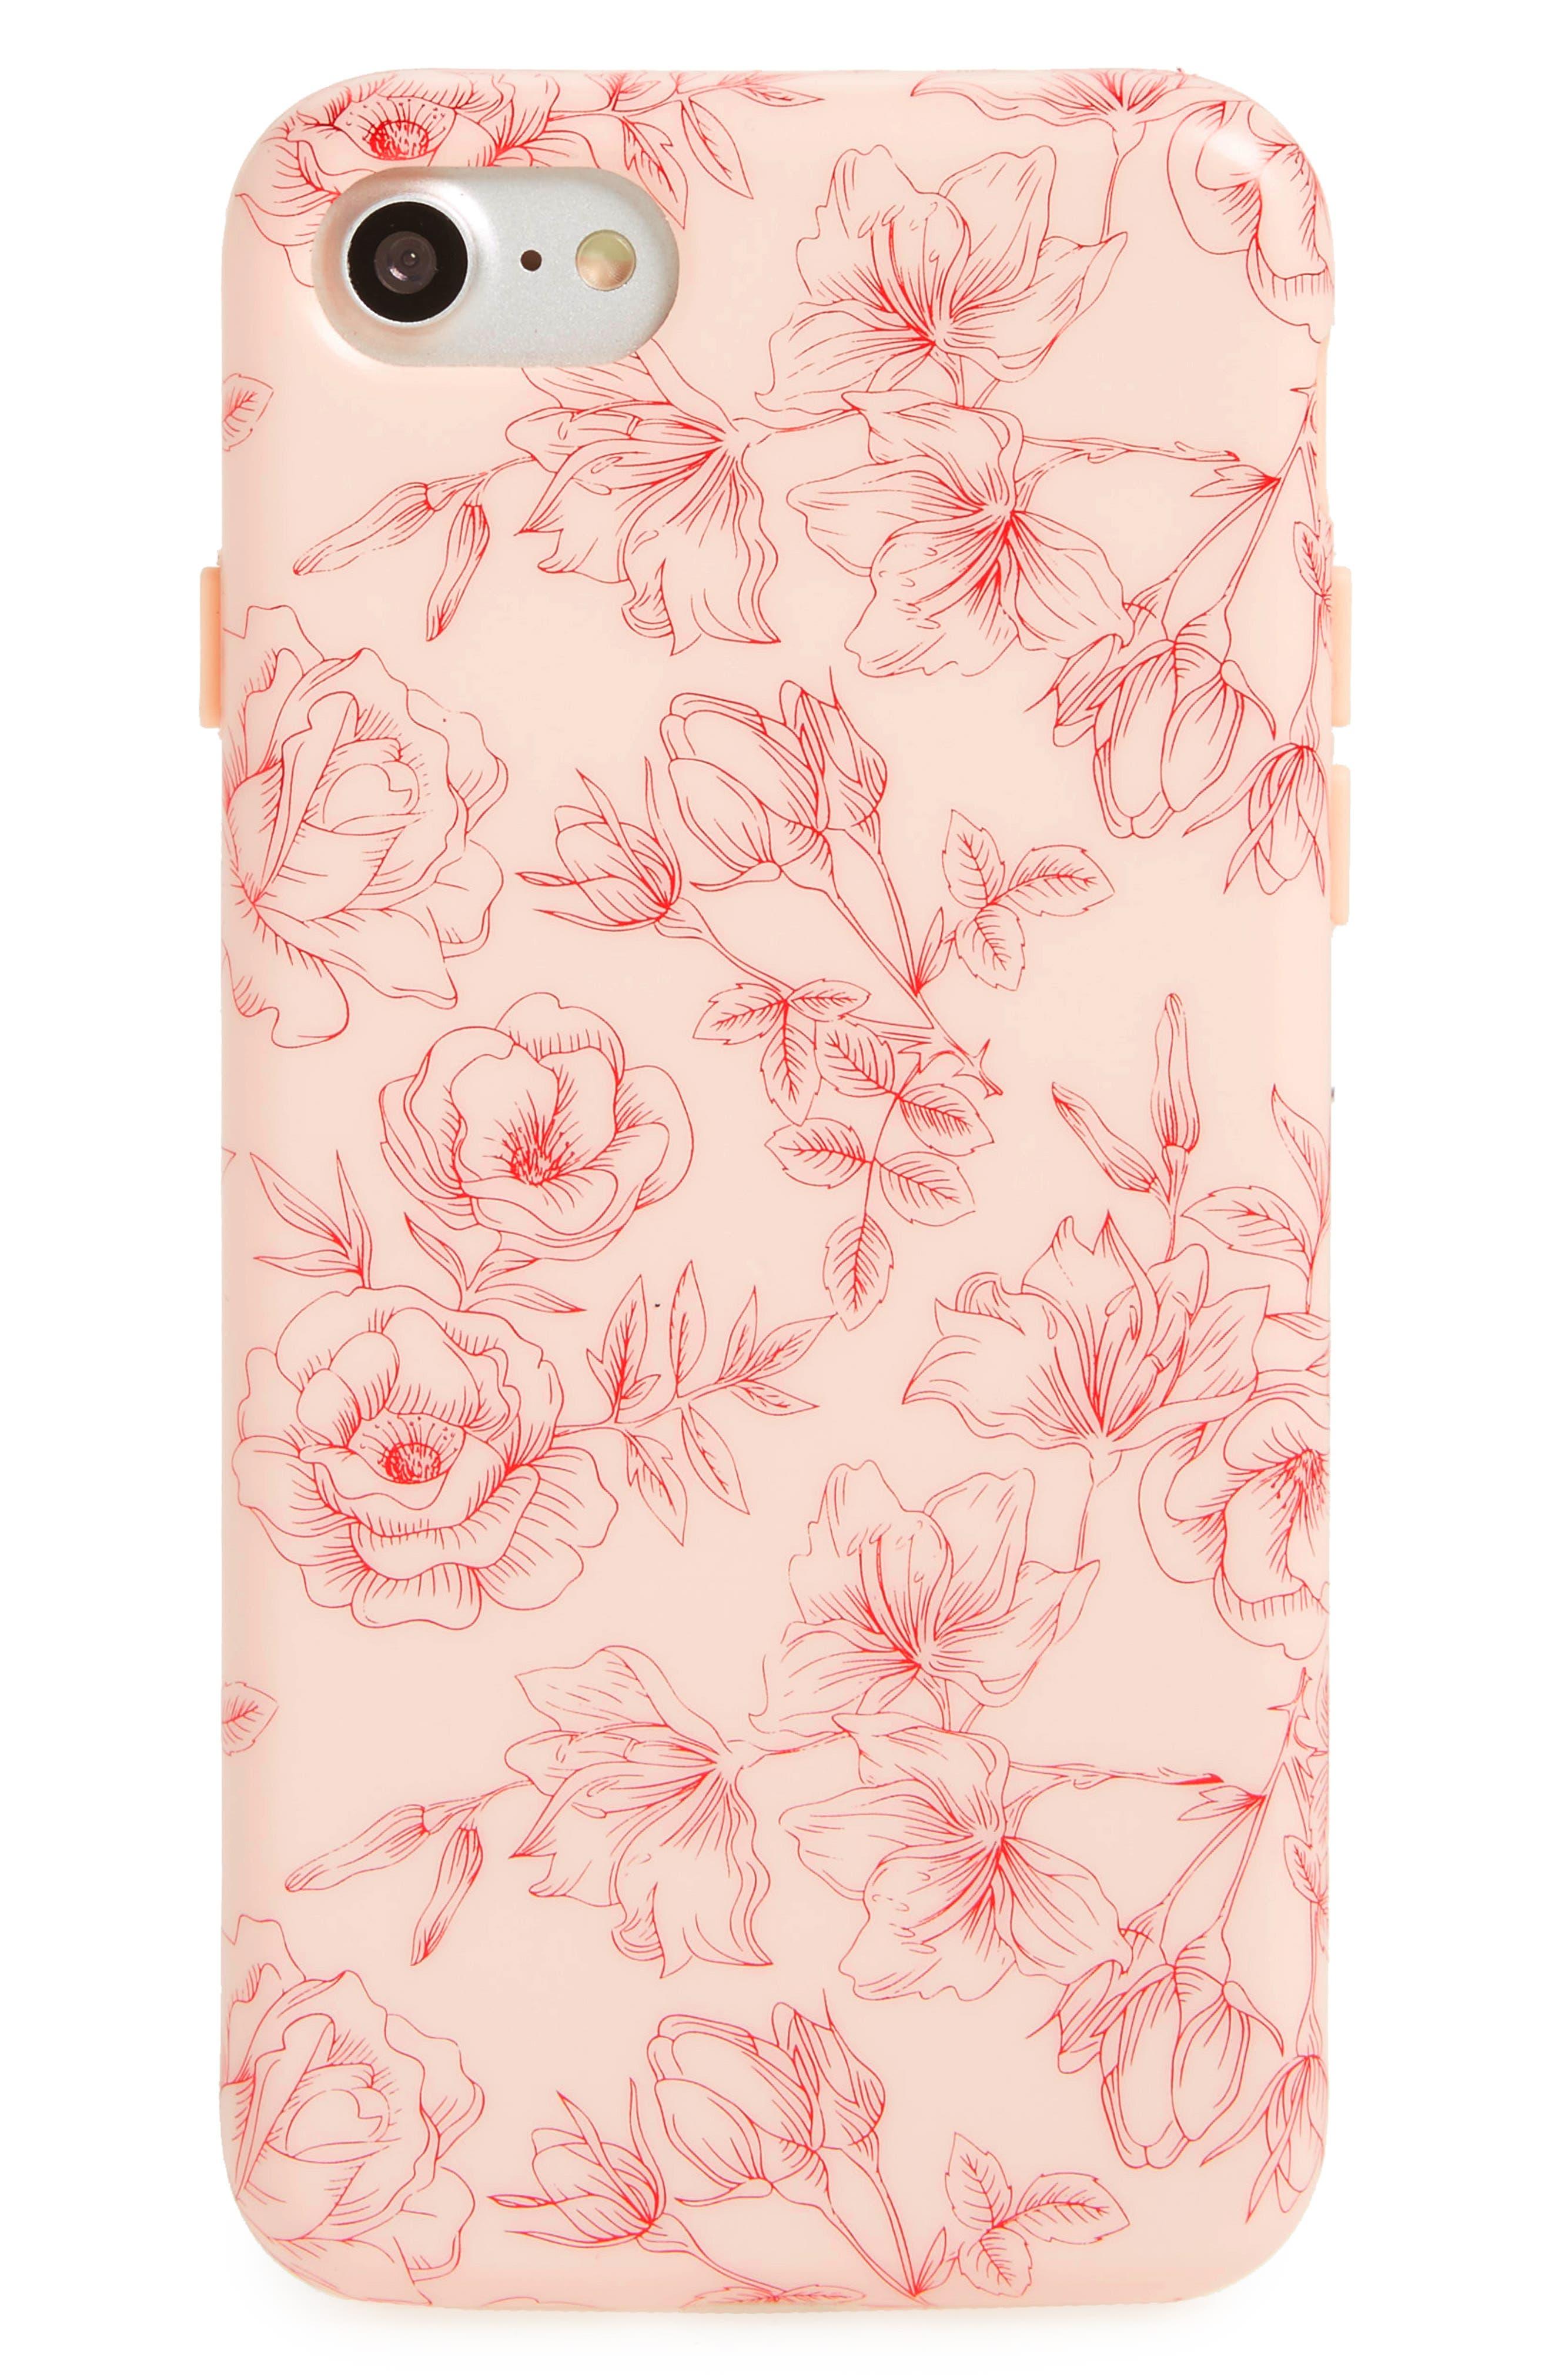 Floral Chrome iPhone 7/8 Case,                             Main thumbnail 1, color,                             Pink